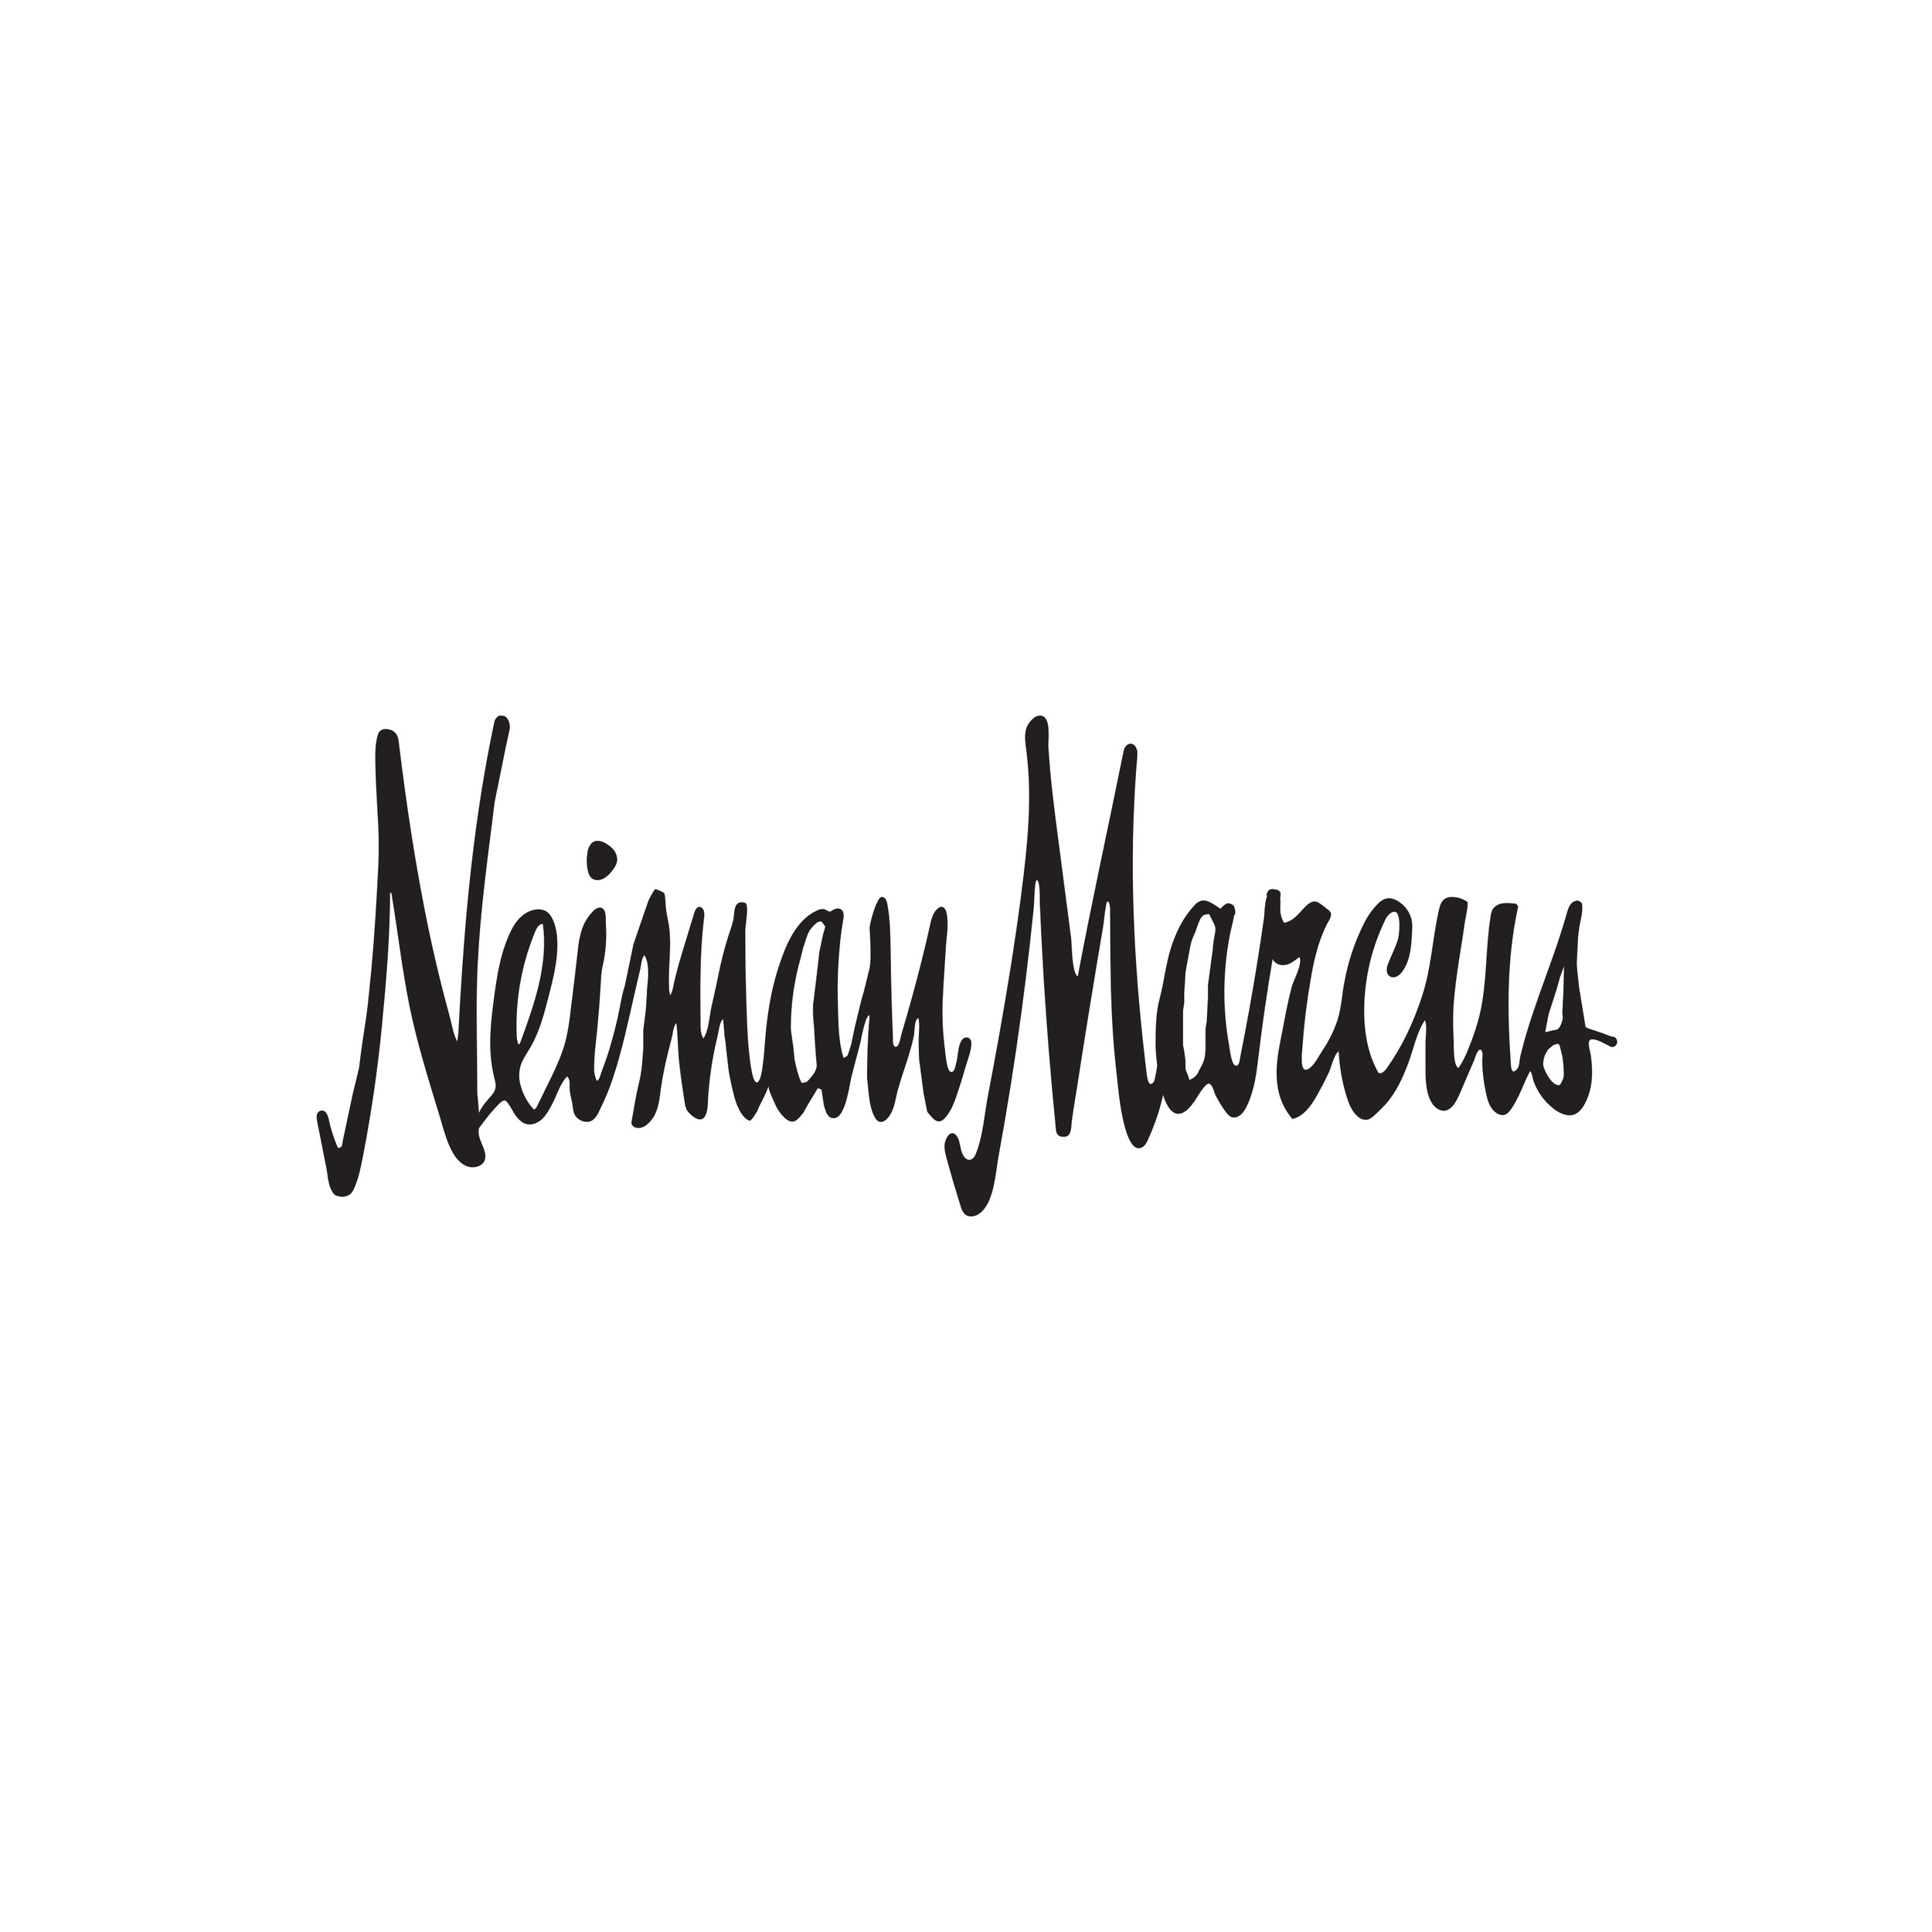 Neiman Marcus - Shop Now!